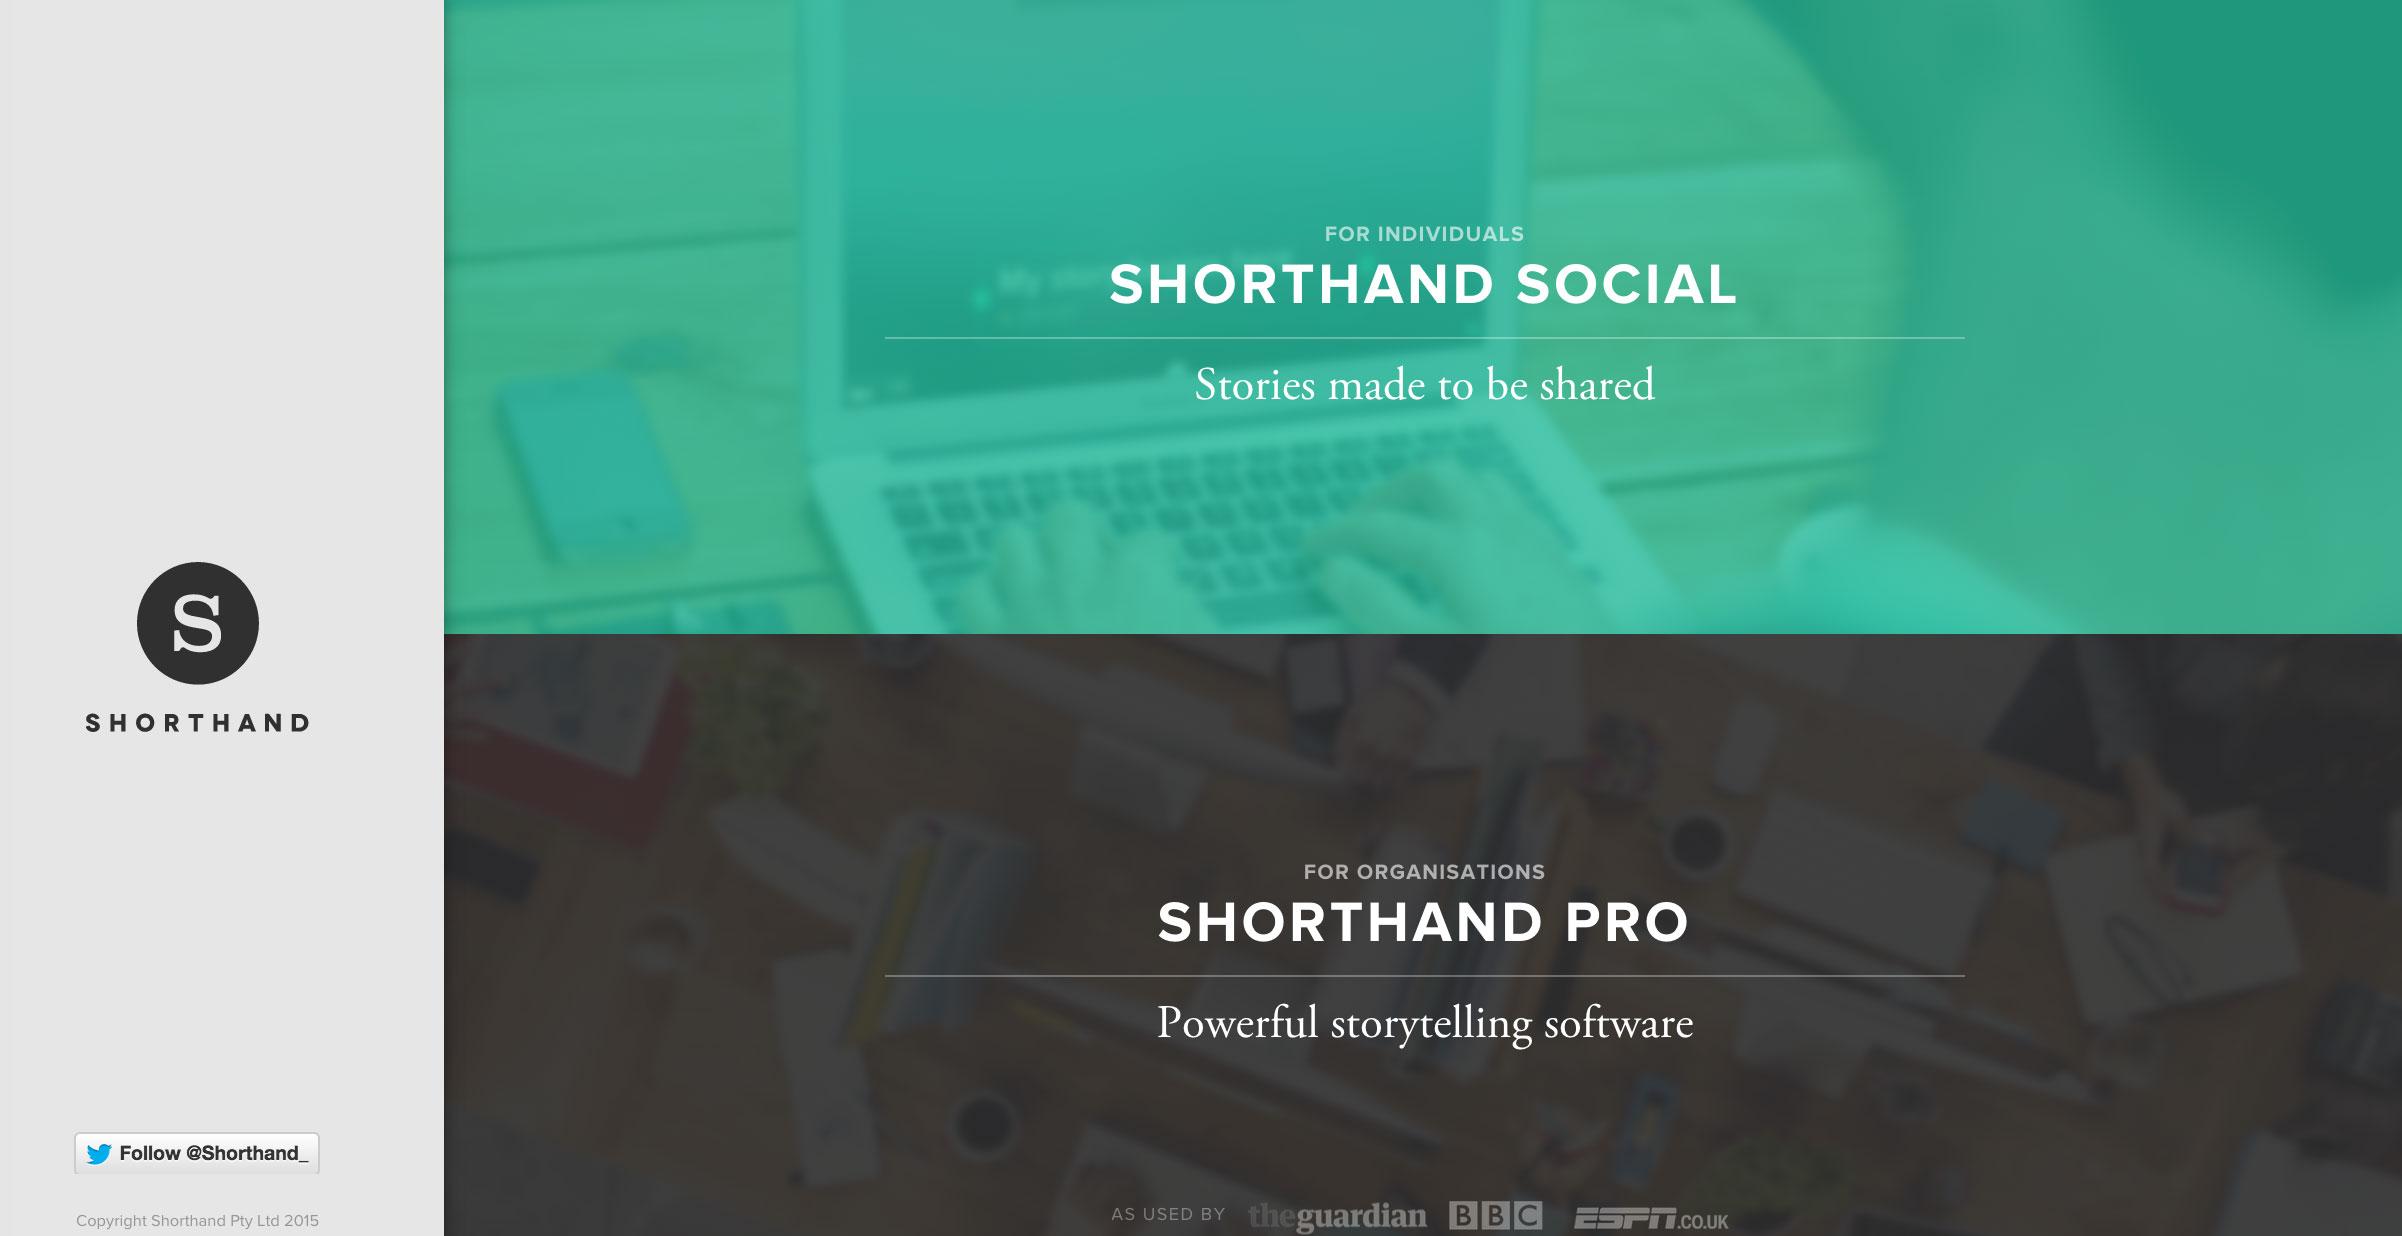 Shortand_Tool_VisualStorytelling_OK